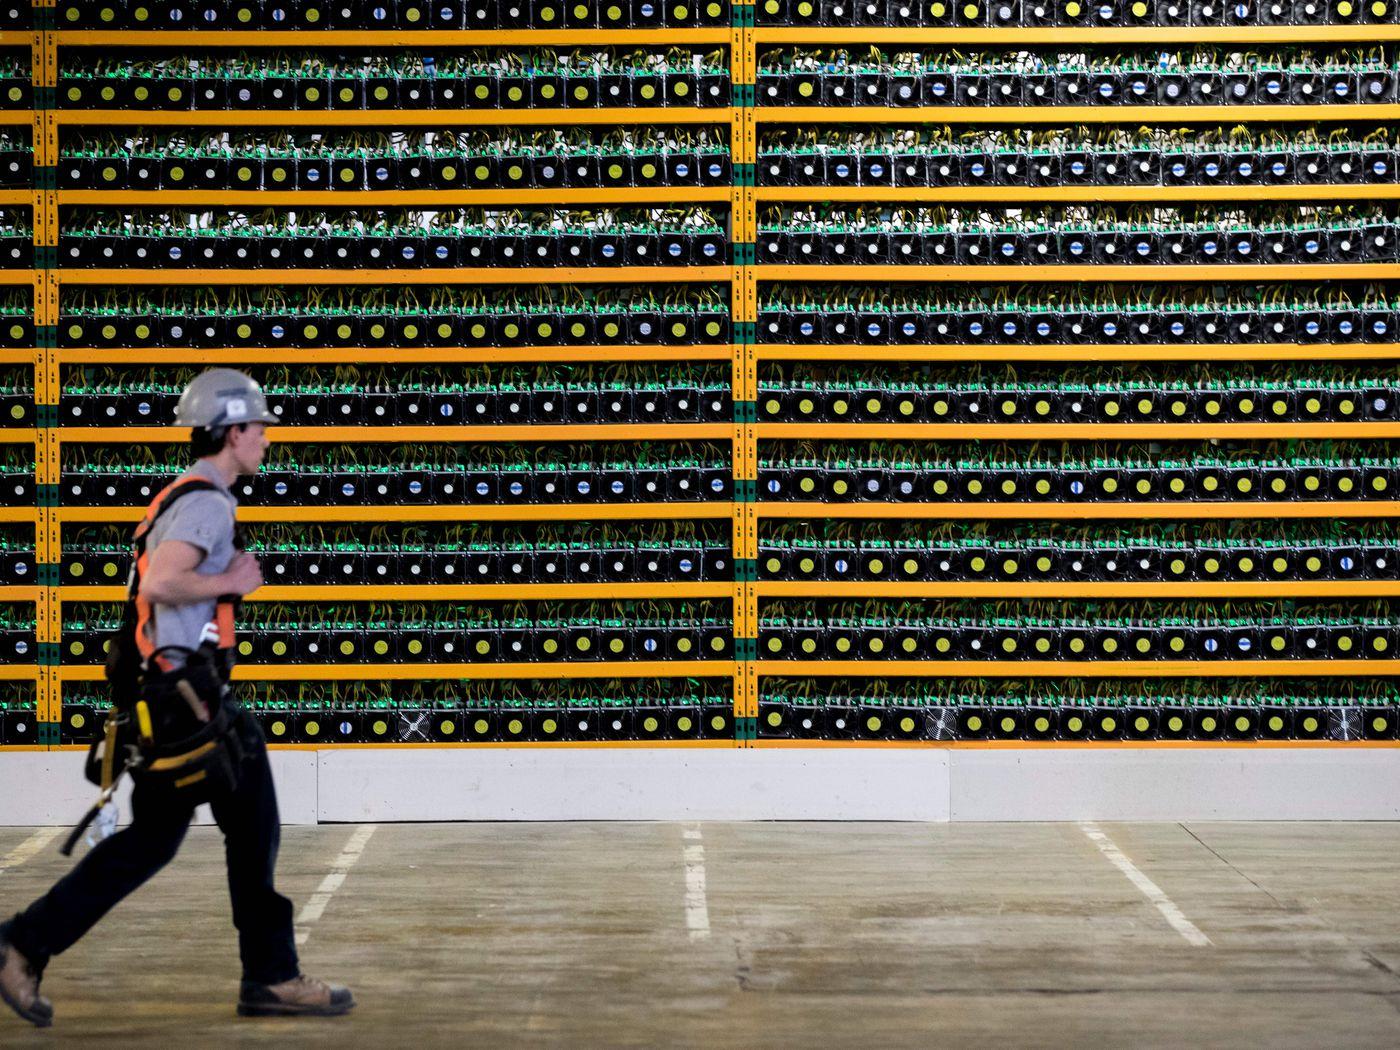 compararea pieței bitcoin